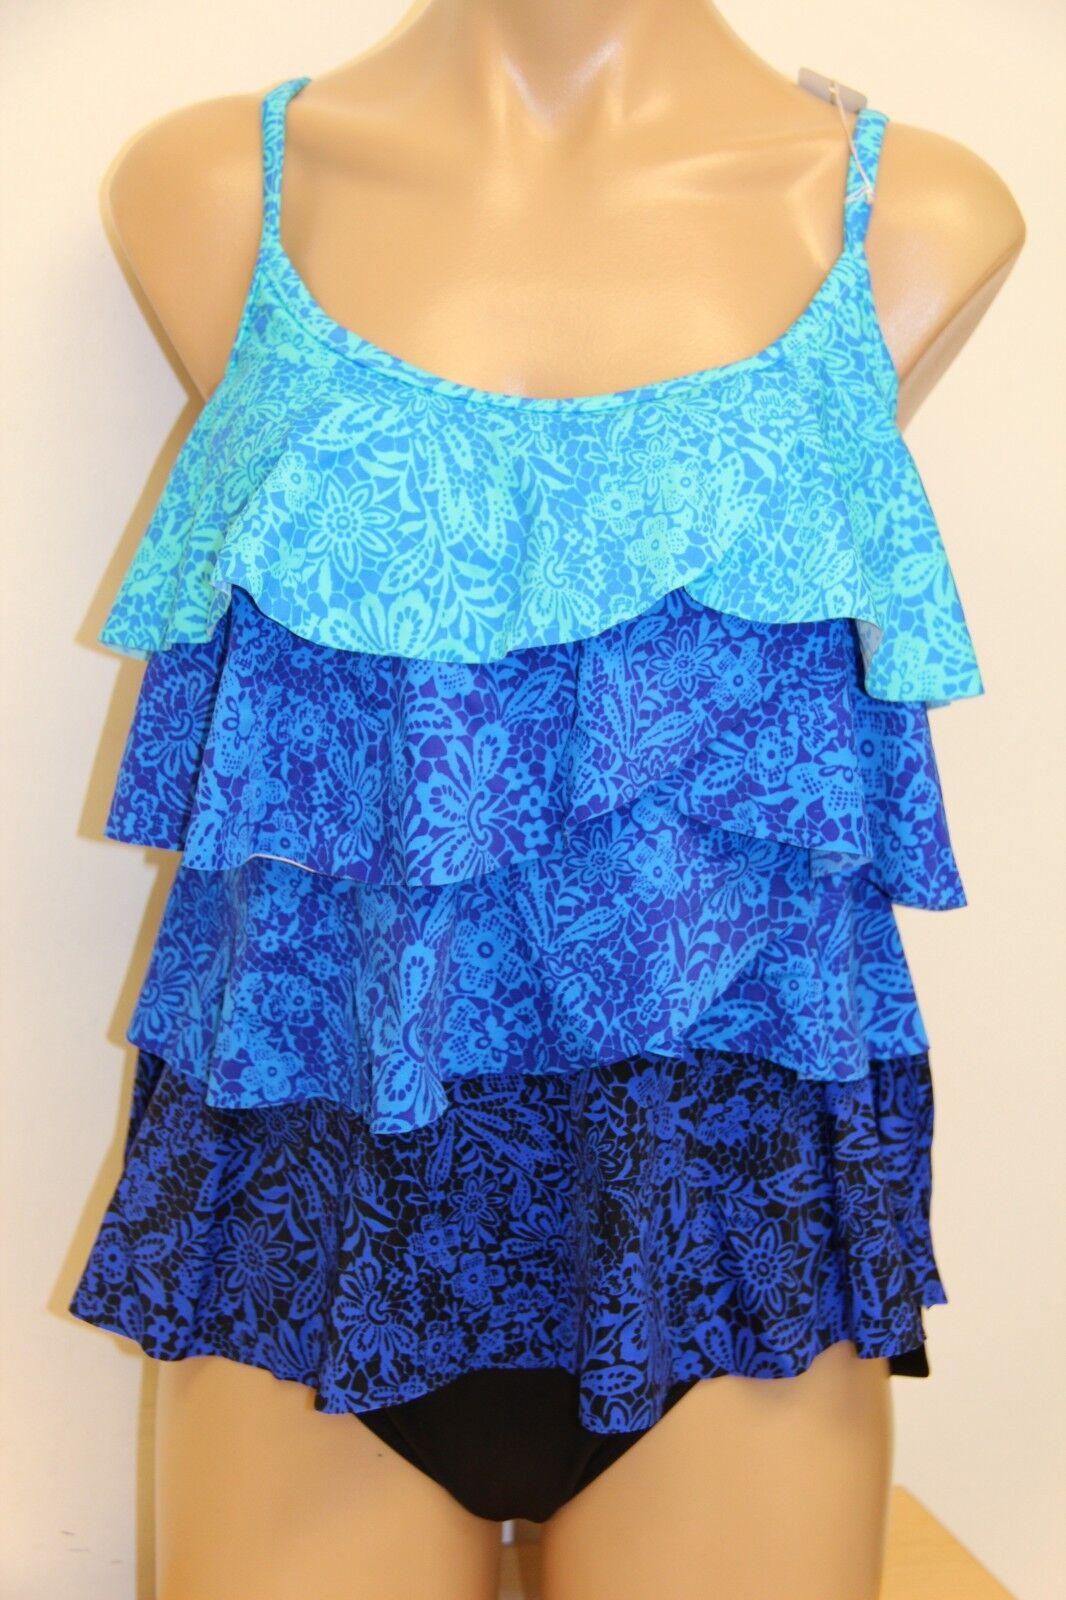 NWT Miraclesuit Swimsuit Tankini 2 pc set sz 6 8 bluee Basic Ruffles